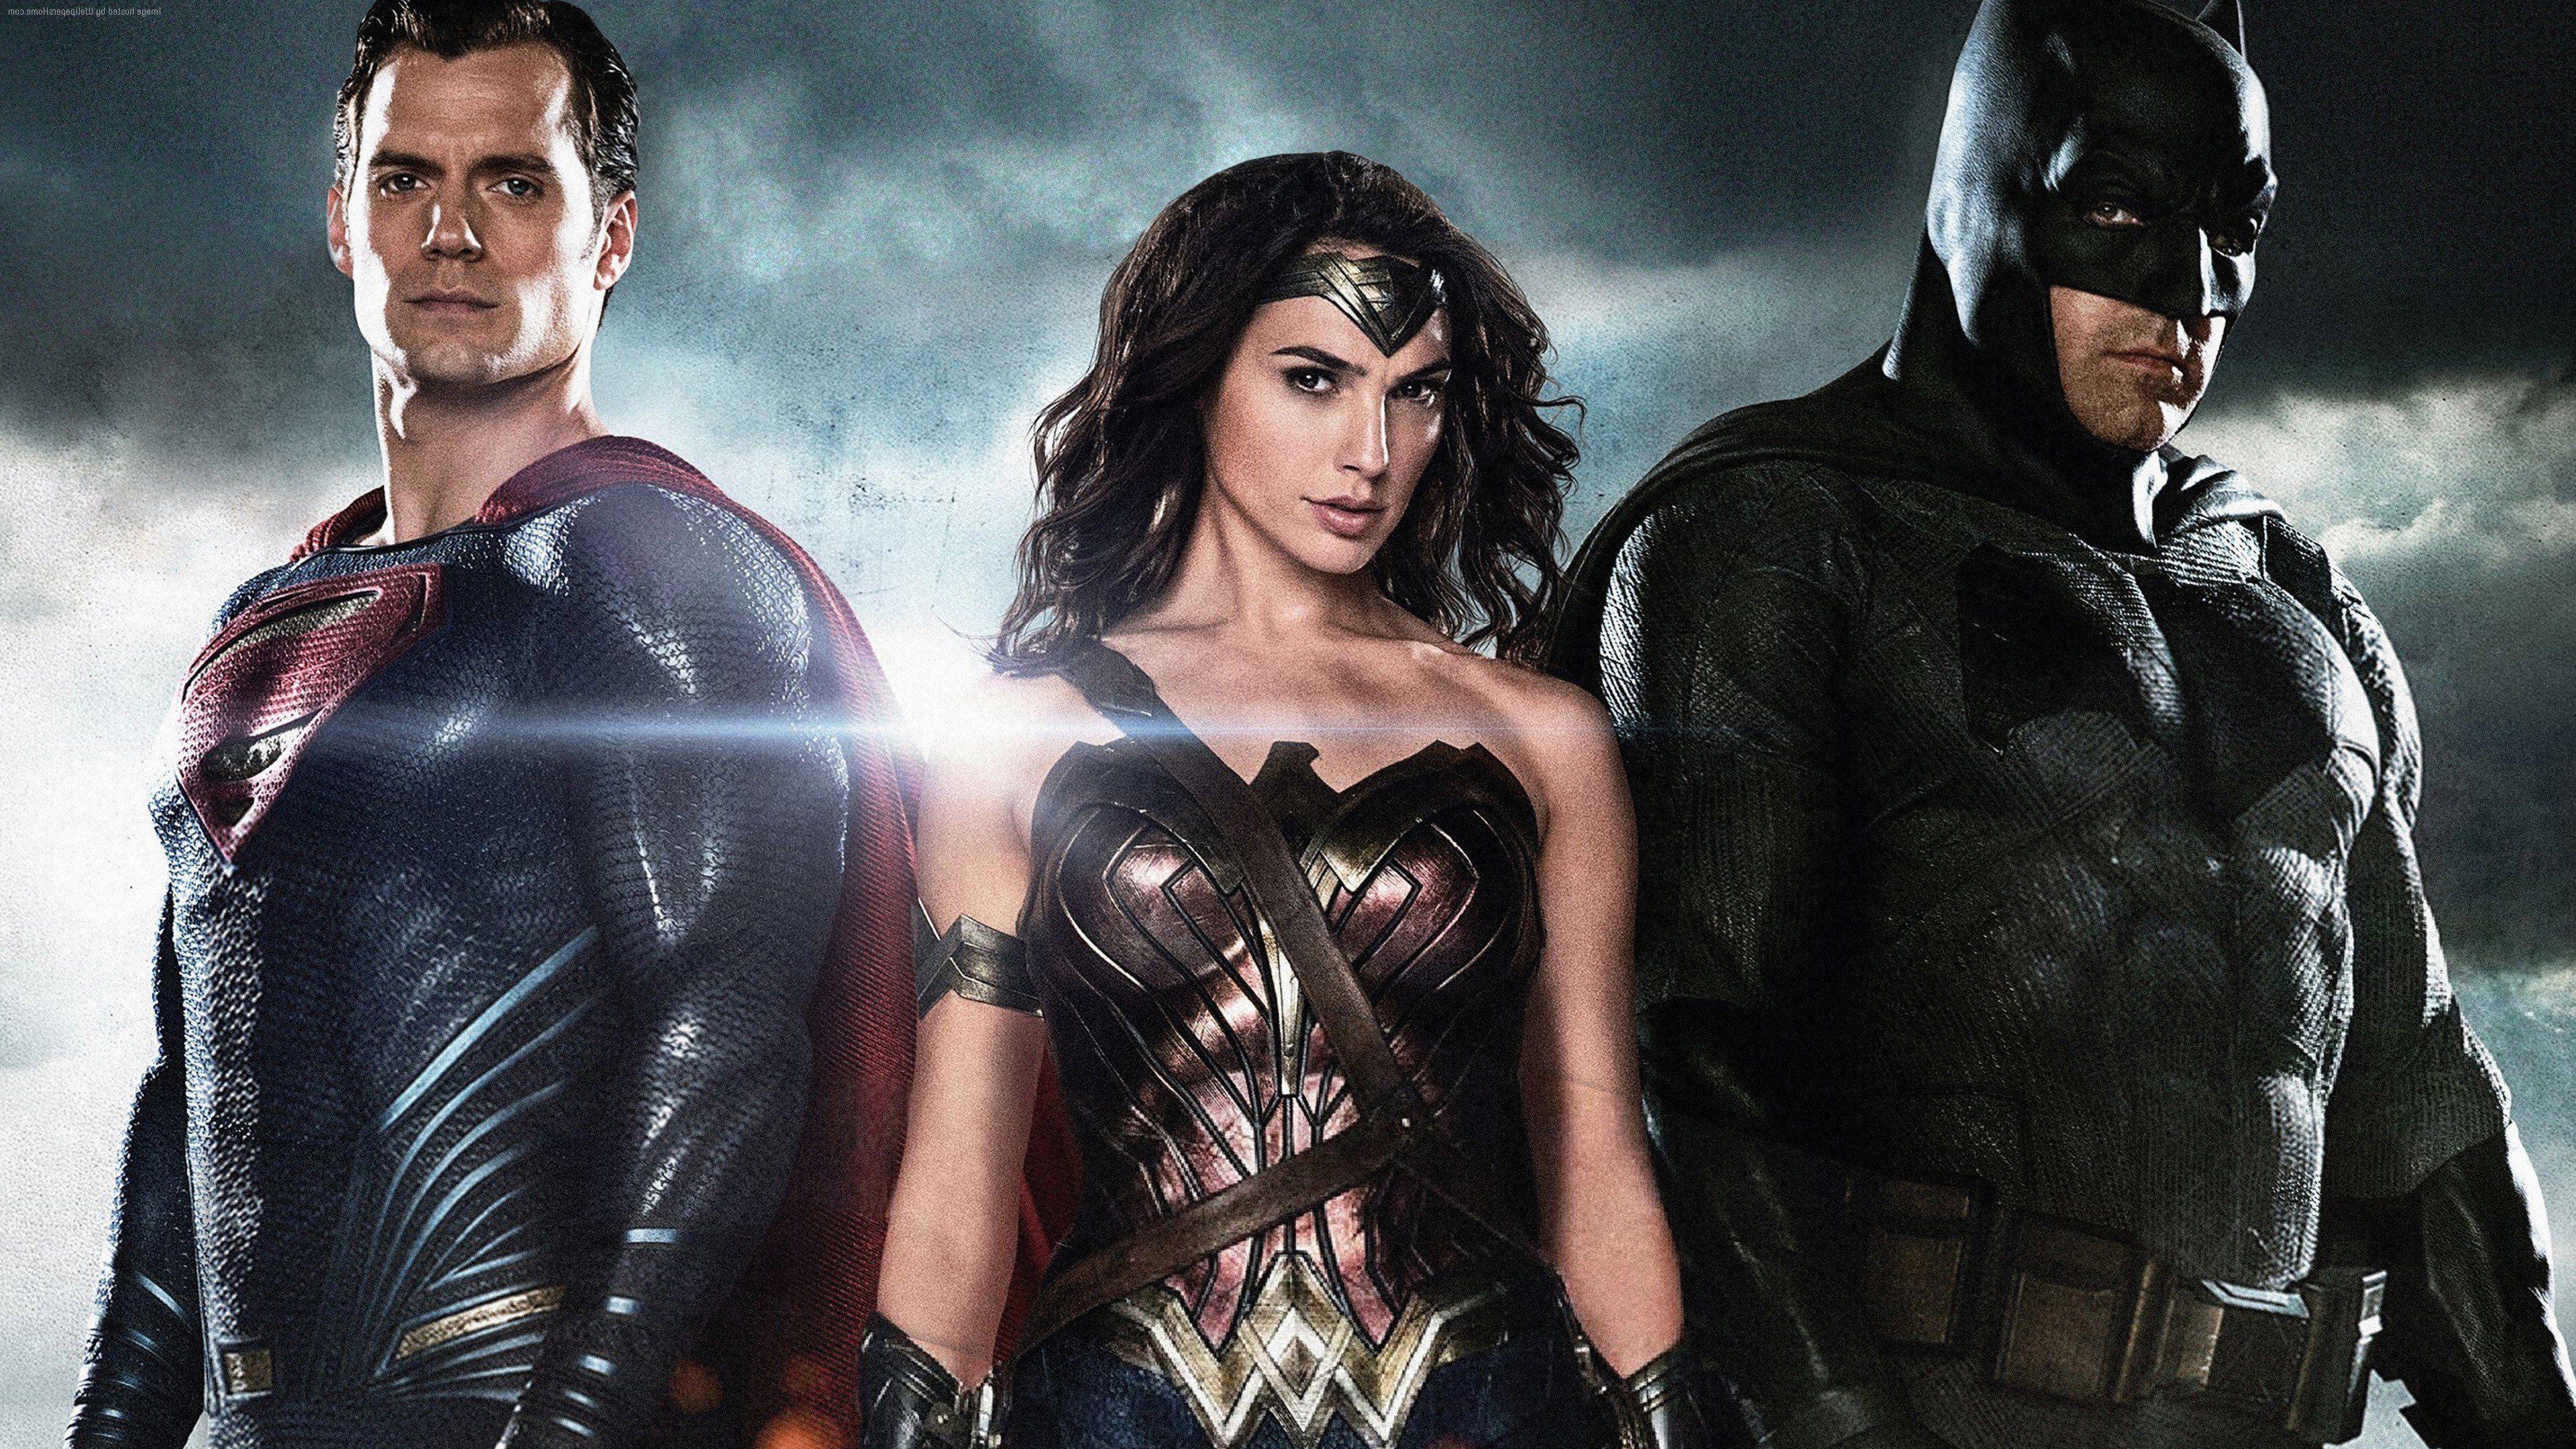 Batman Superman Wonder Woman Wallpaper | Movies HD Wallpapers